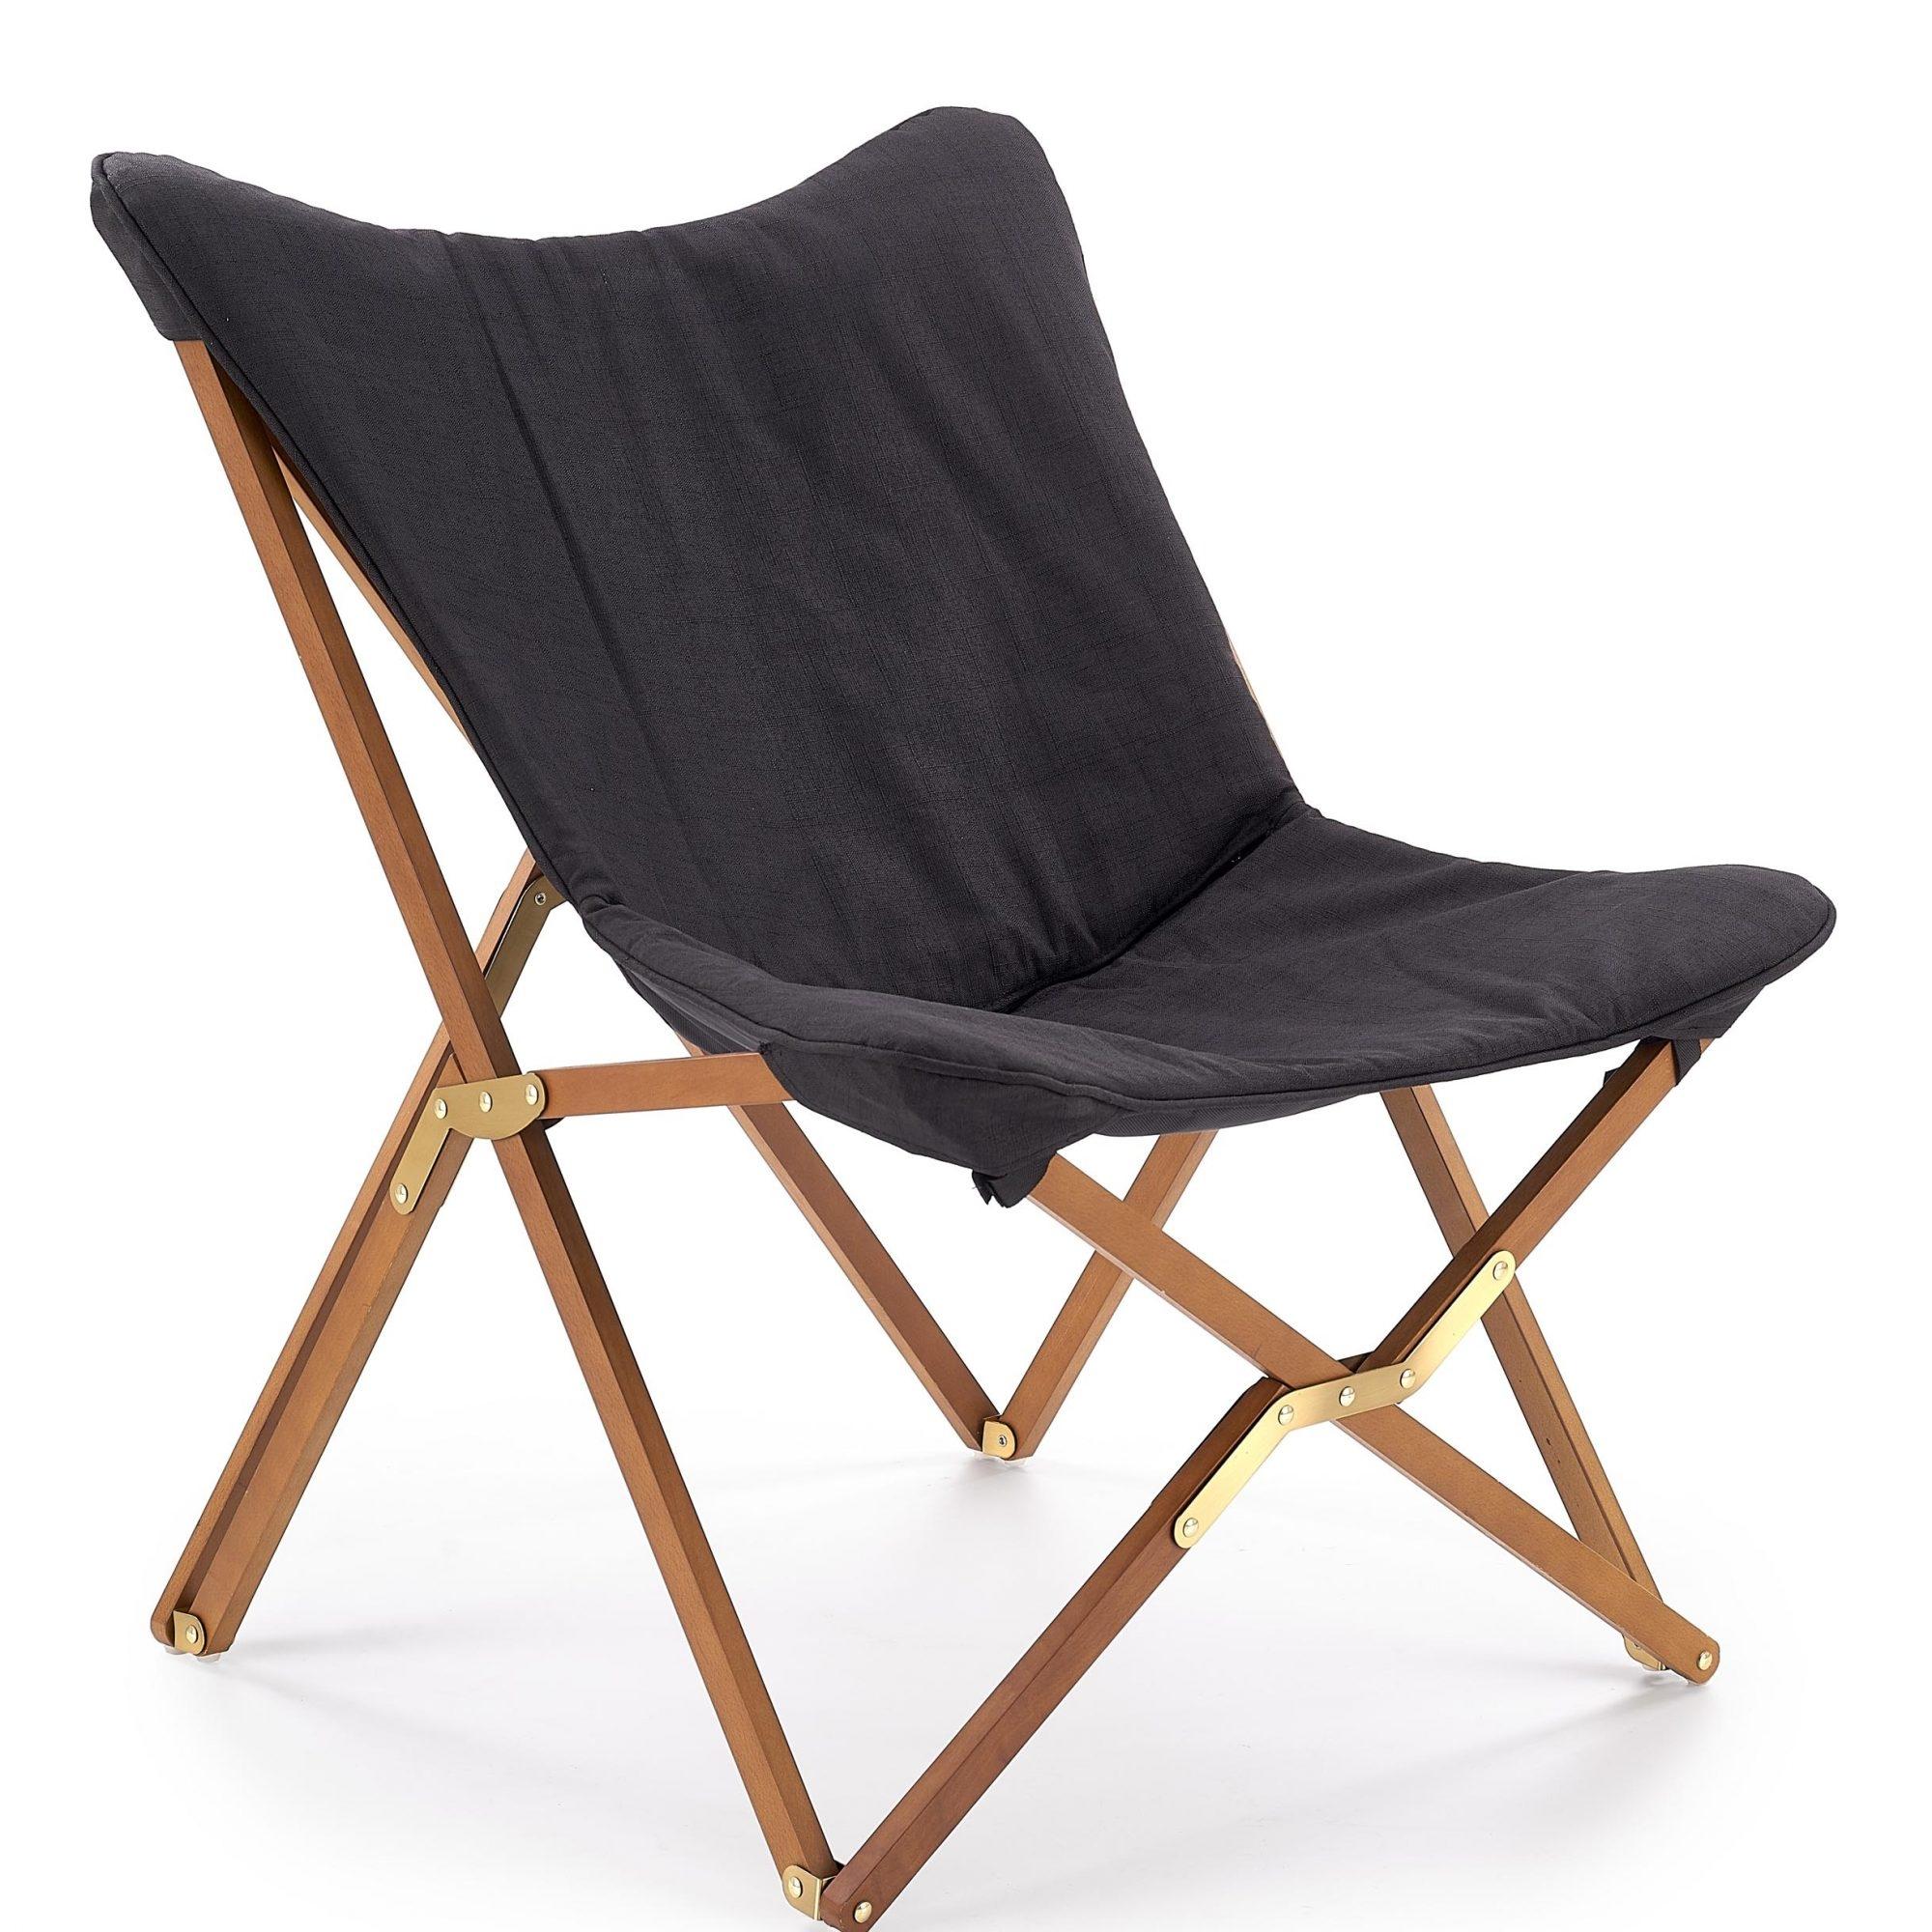 Scaun pliabil din lemn si stofa Volant Dark Grey / Walnut l76xA83xH97 cm